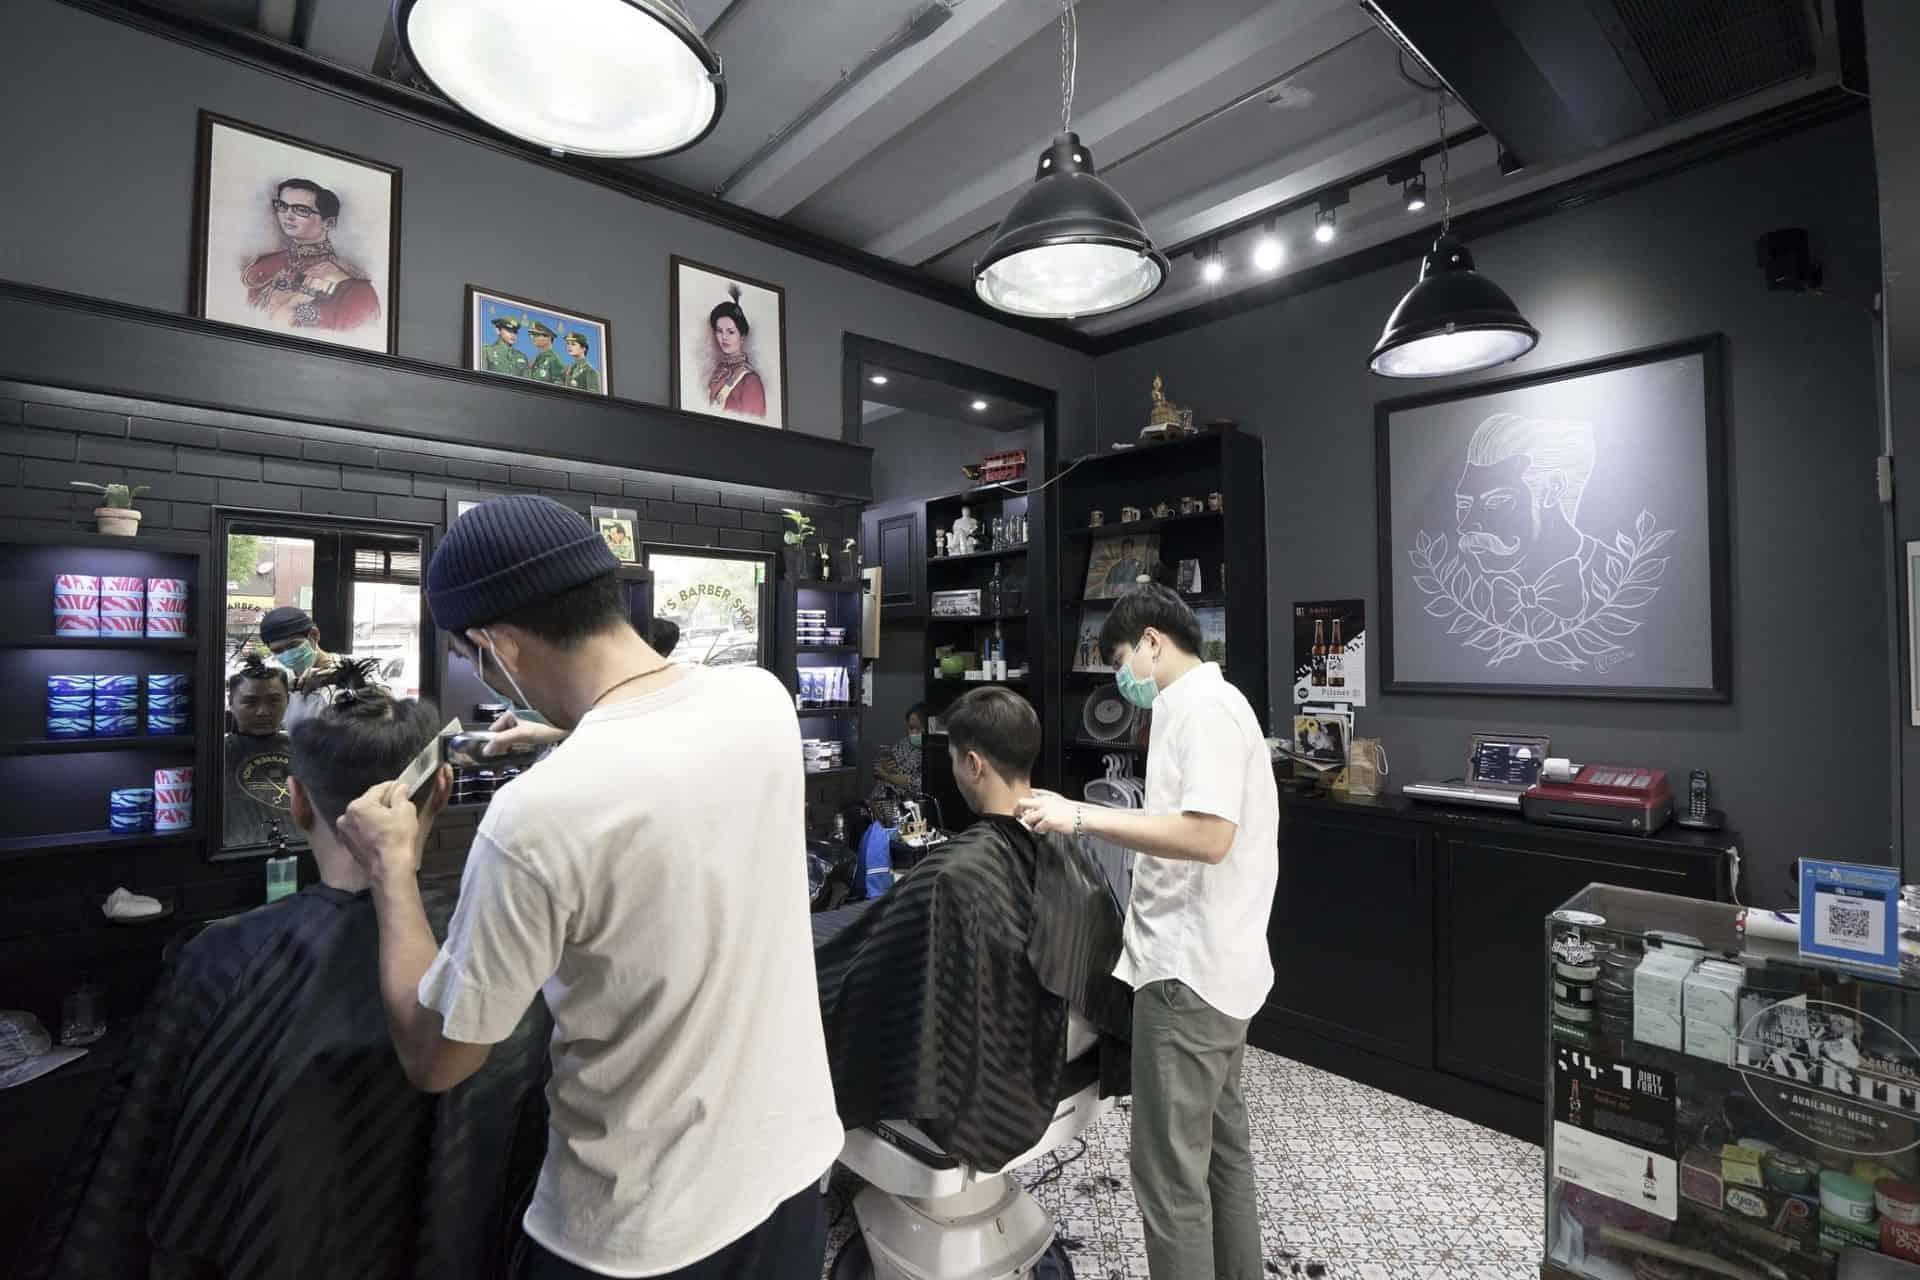 Home - Tew's Barber Shop